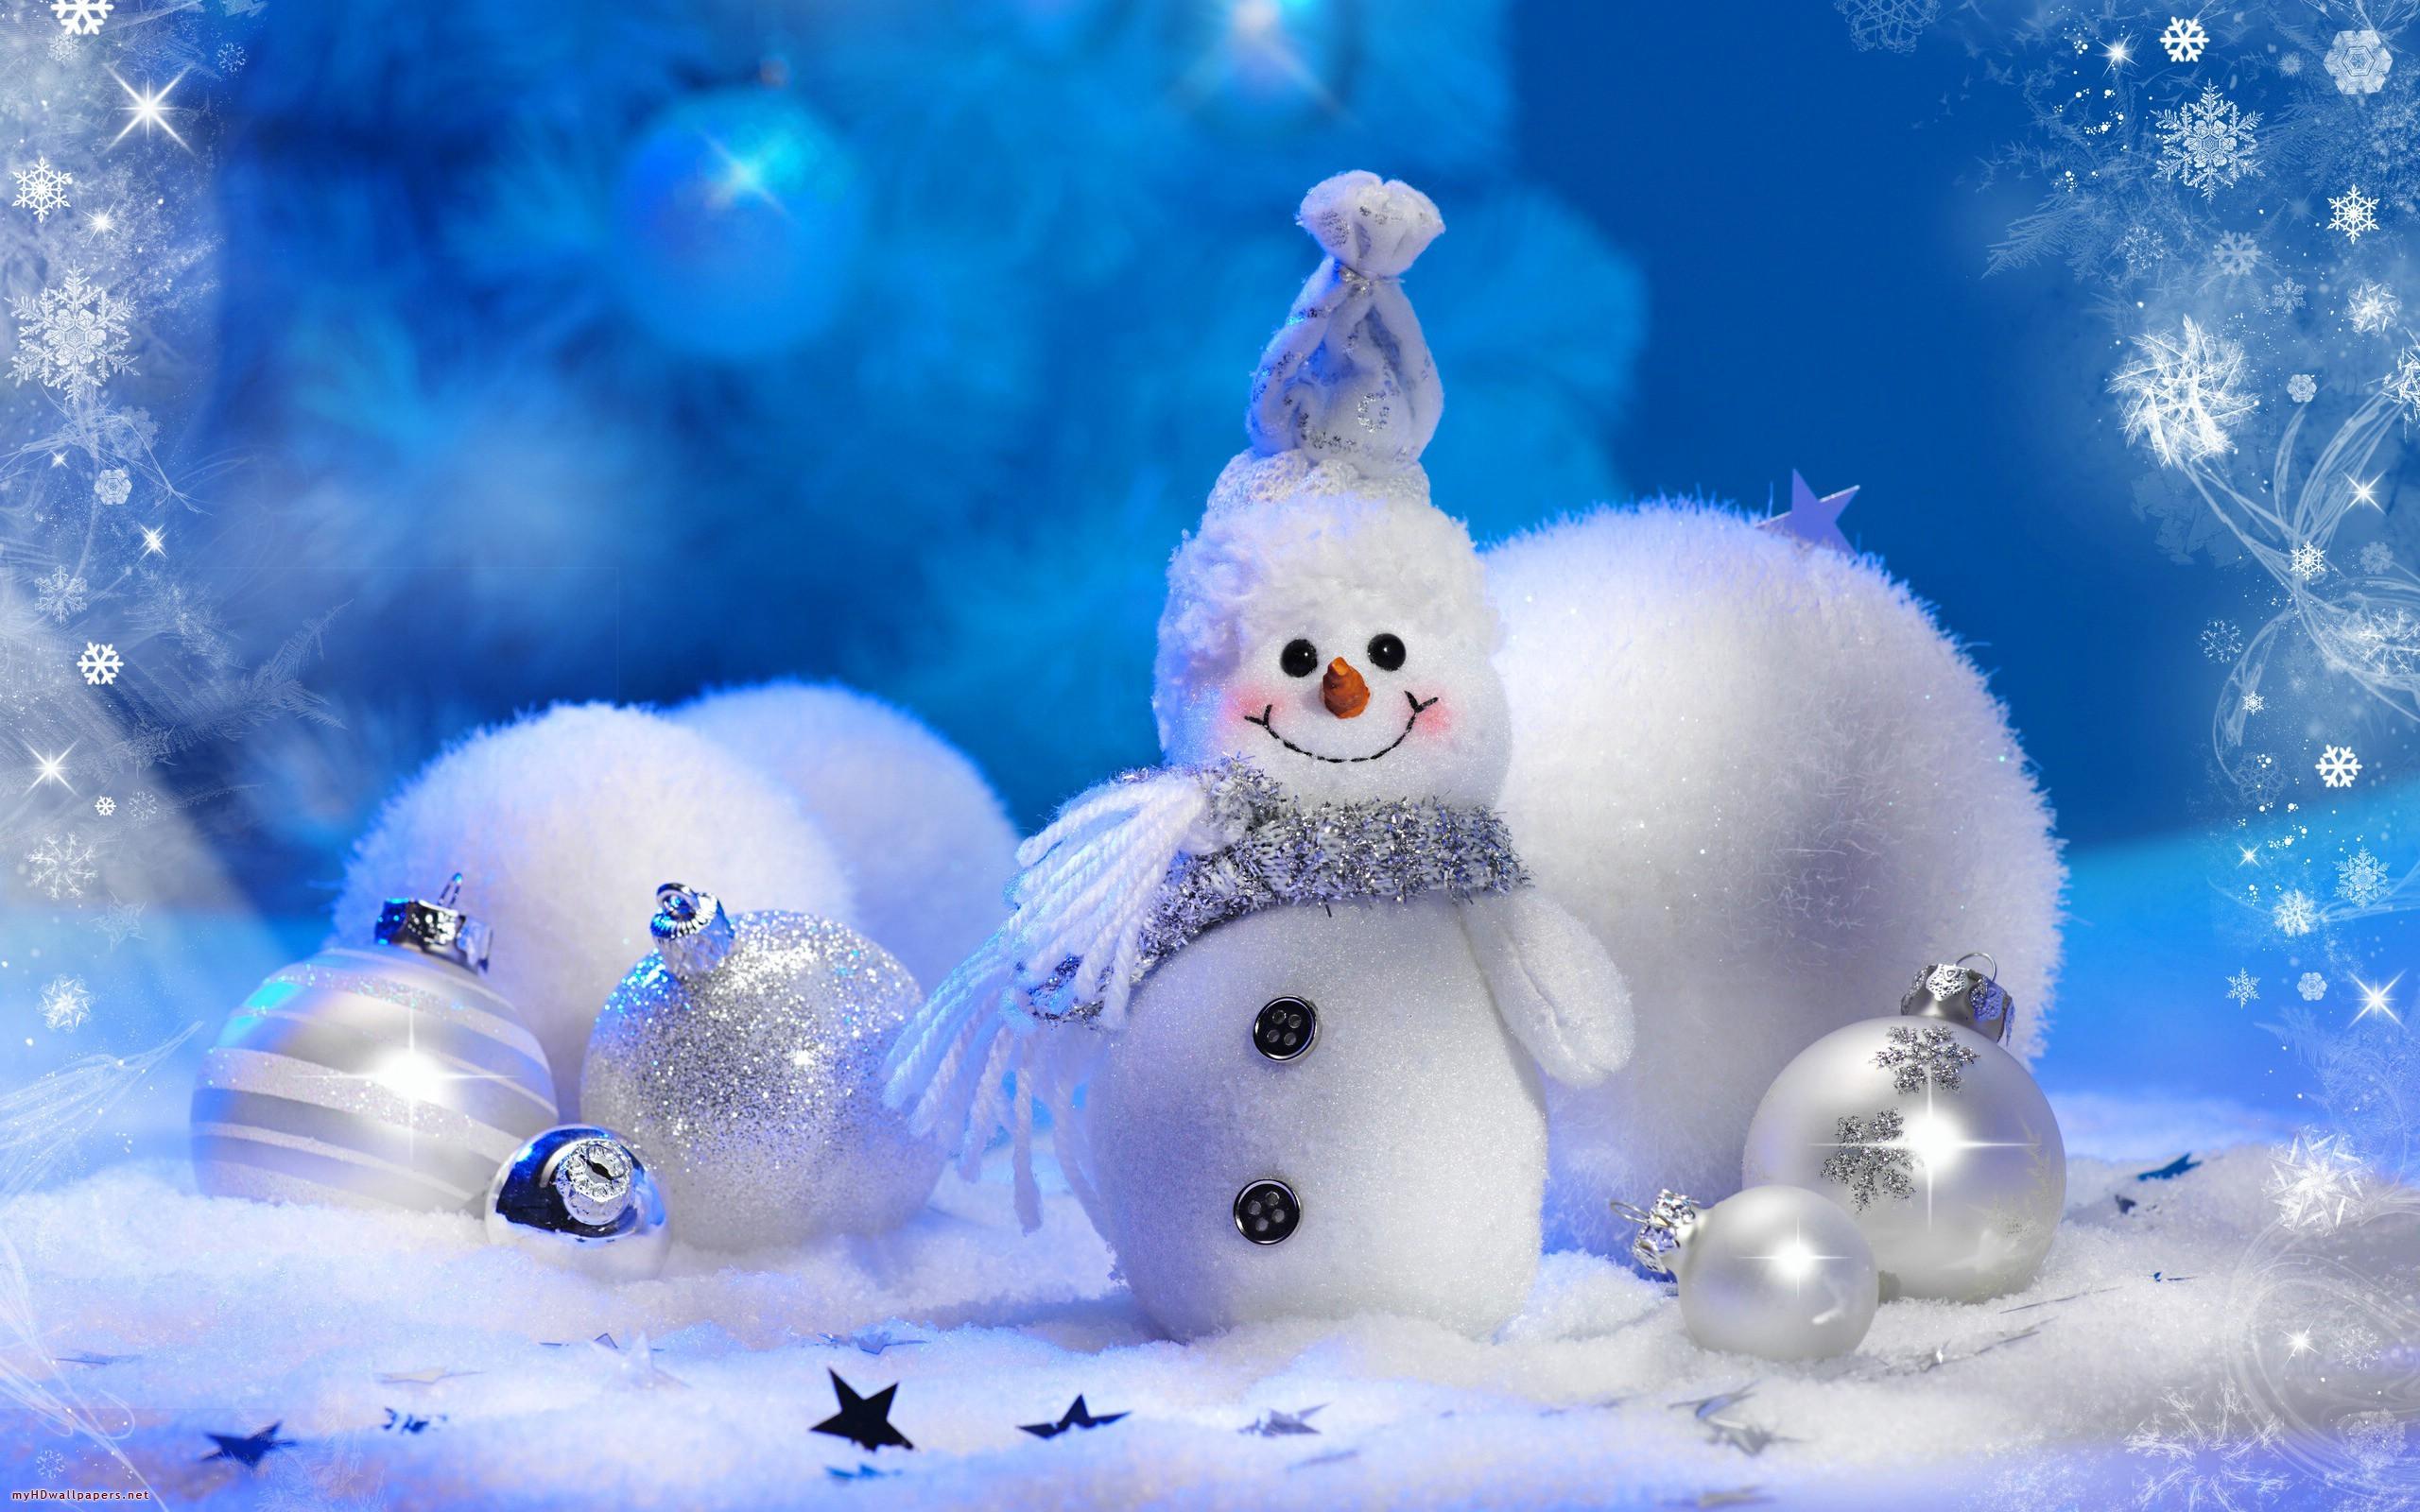 Cute Christmas wallpaper | Best Cool Wallpaper HD Download